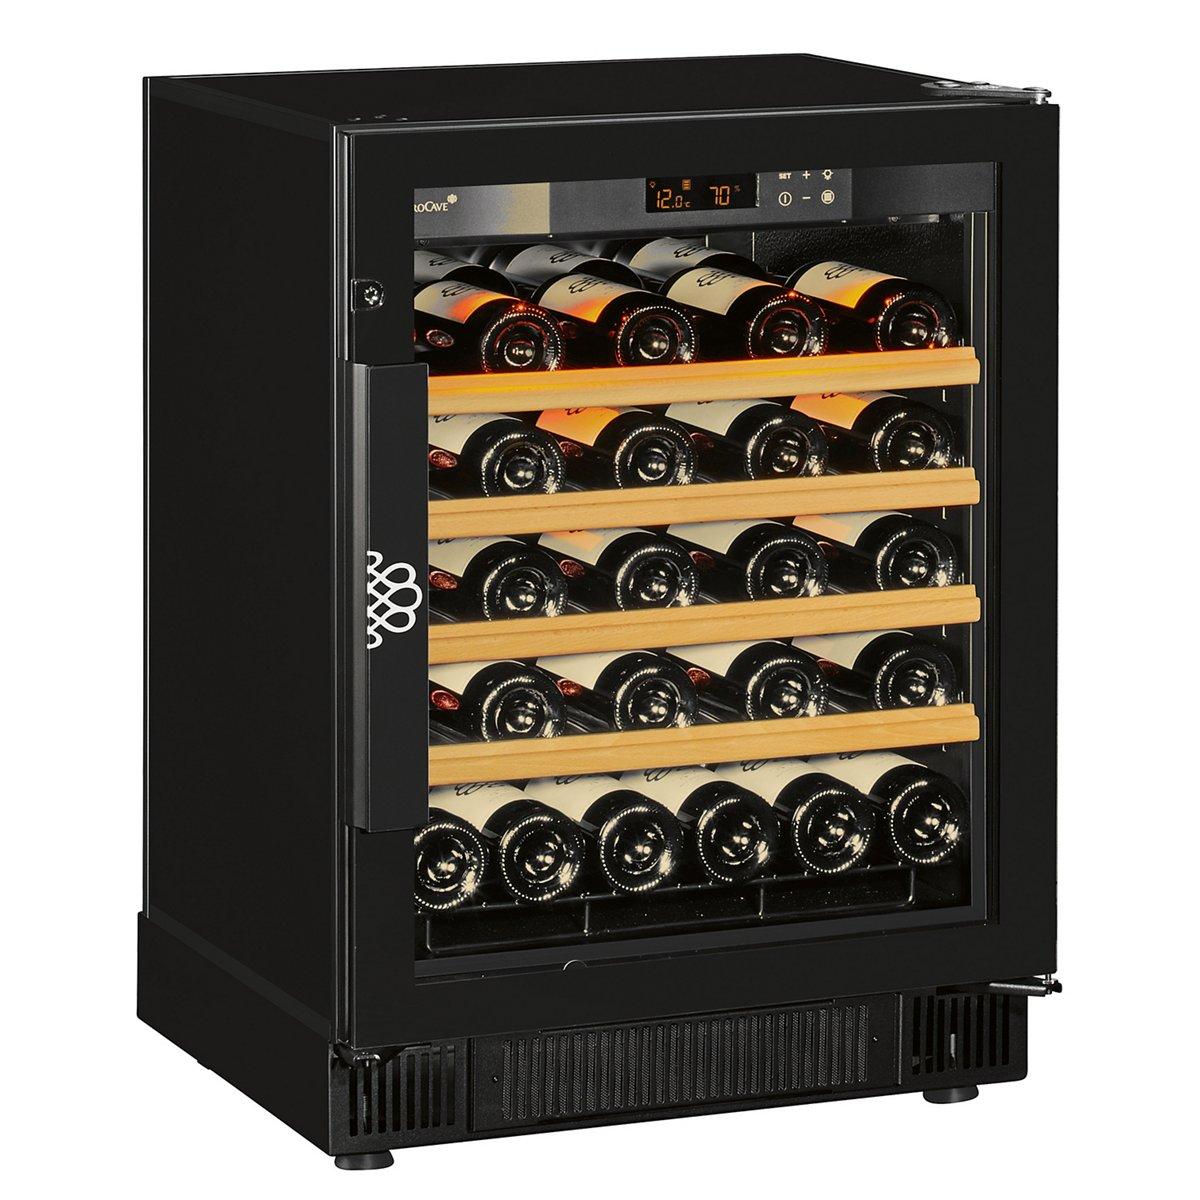 newair-wine-refrigerator